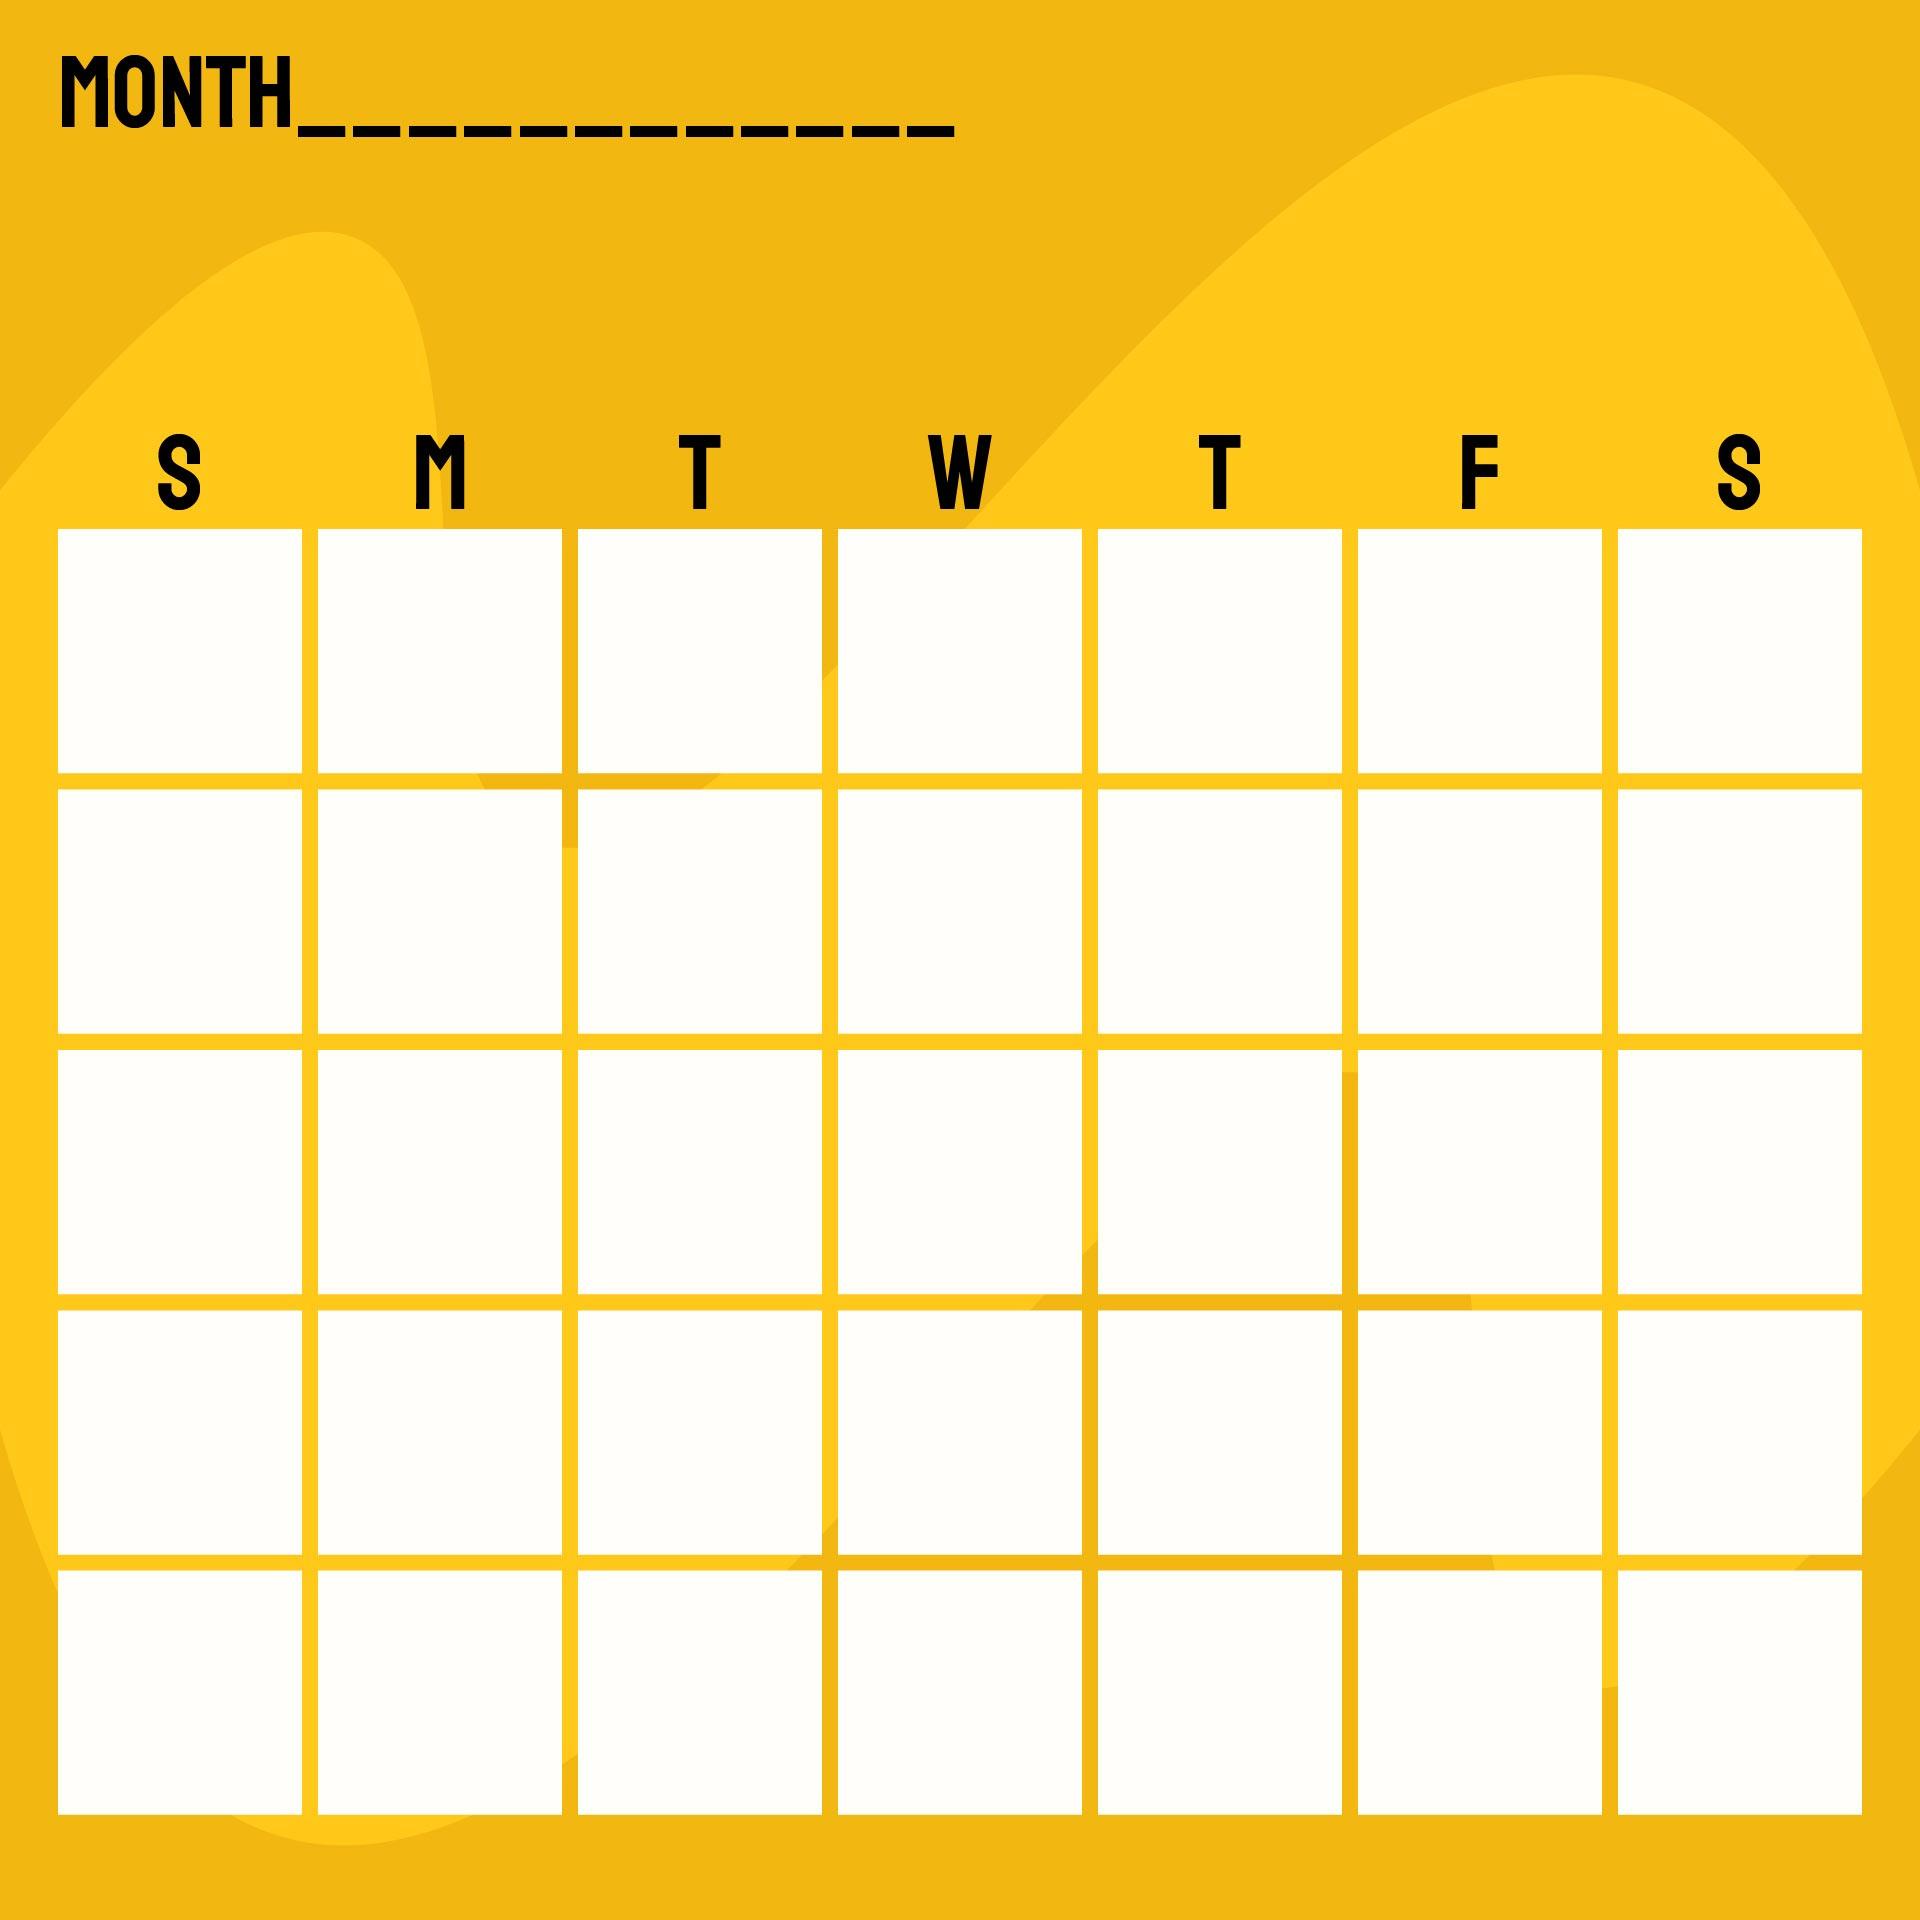 monthly calendar template kindergarten - Calendar